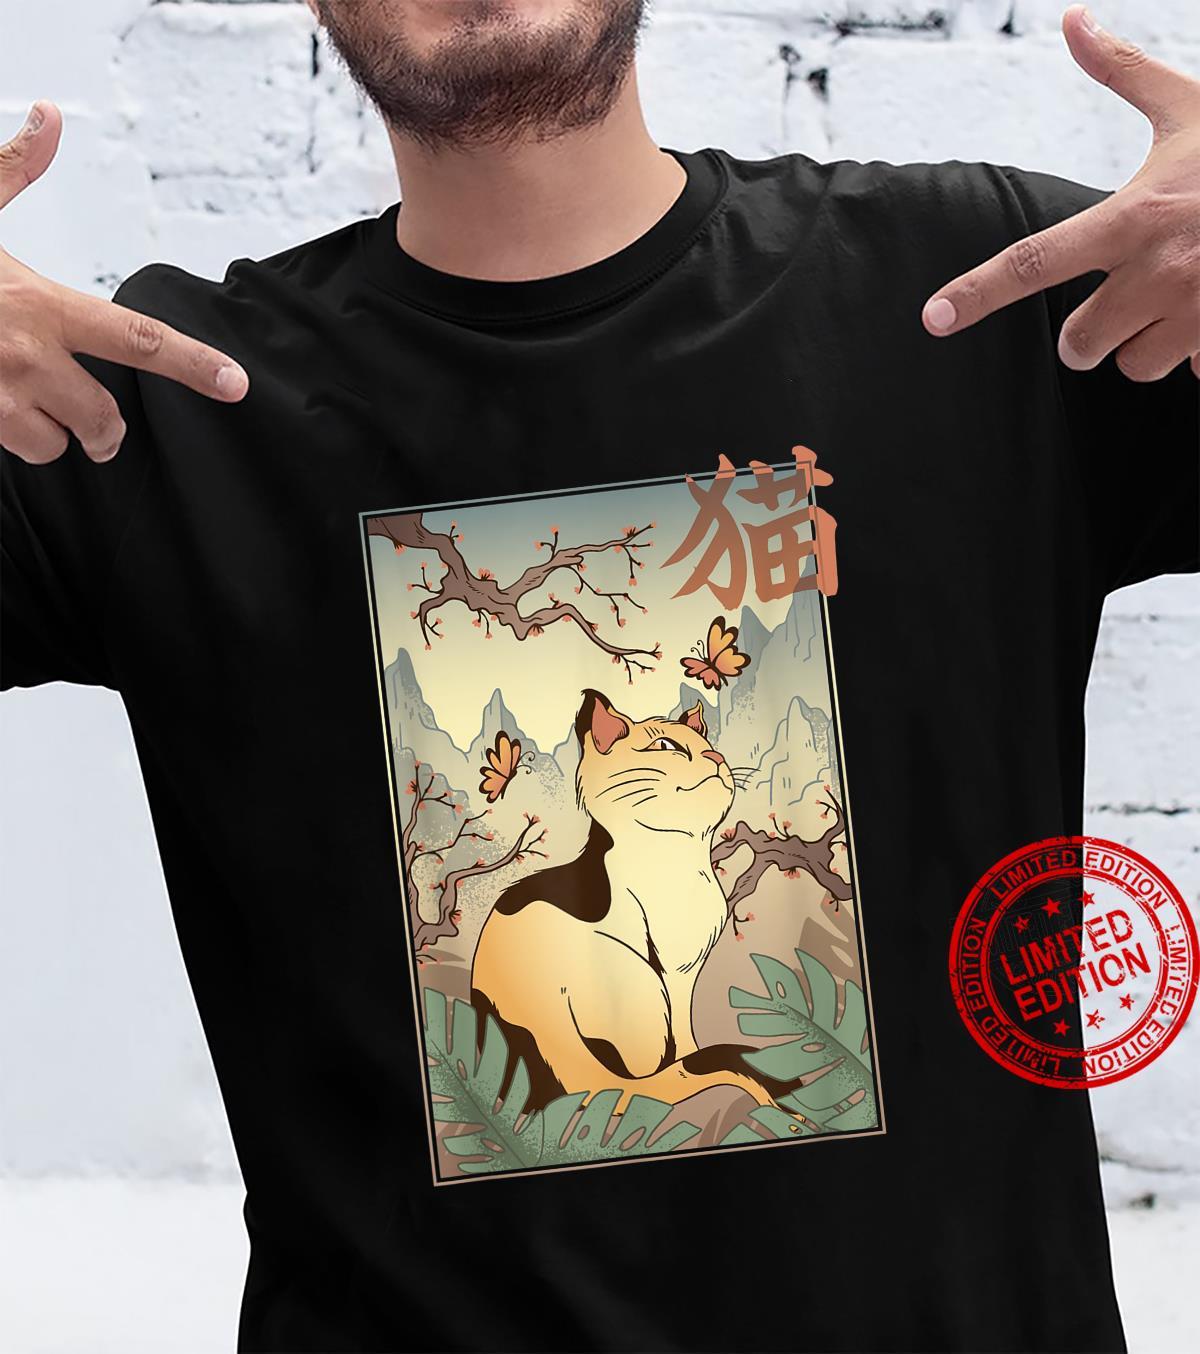 Aesthetic Vaporwave. Asian Japan Style 80s 90s Japanese Cat Shirt